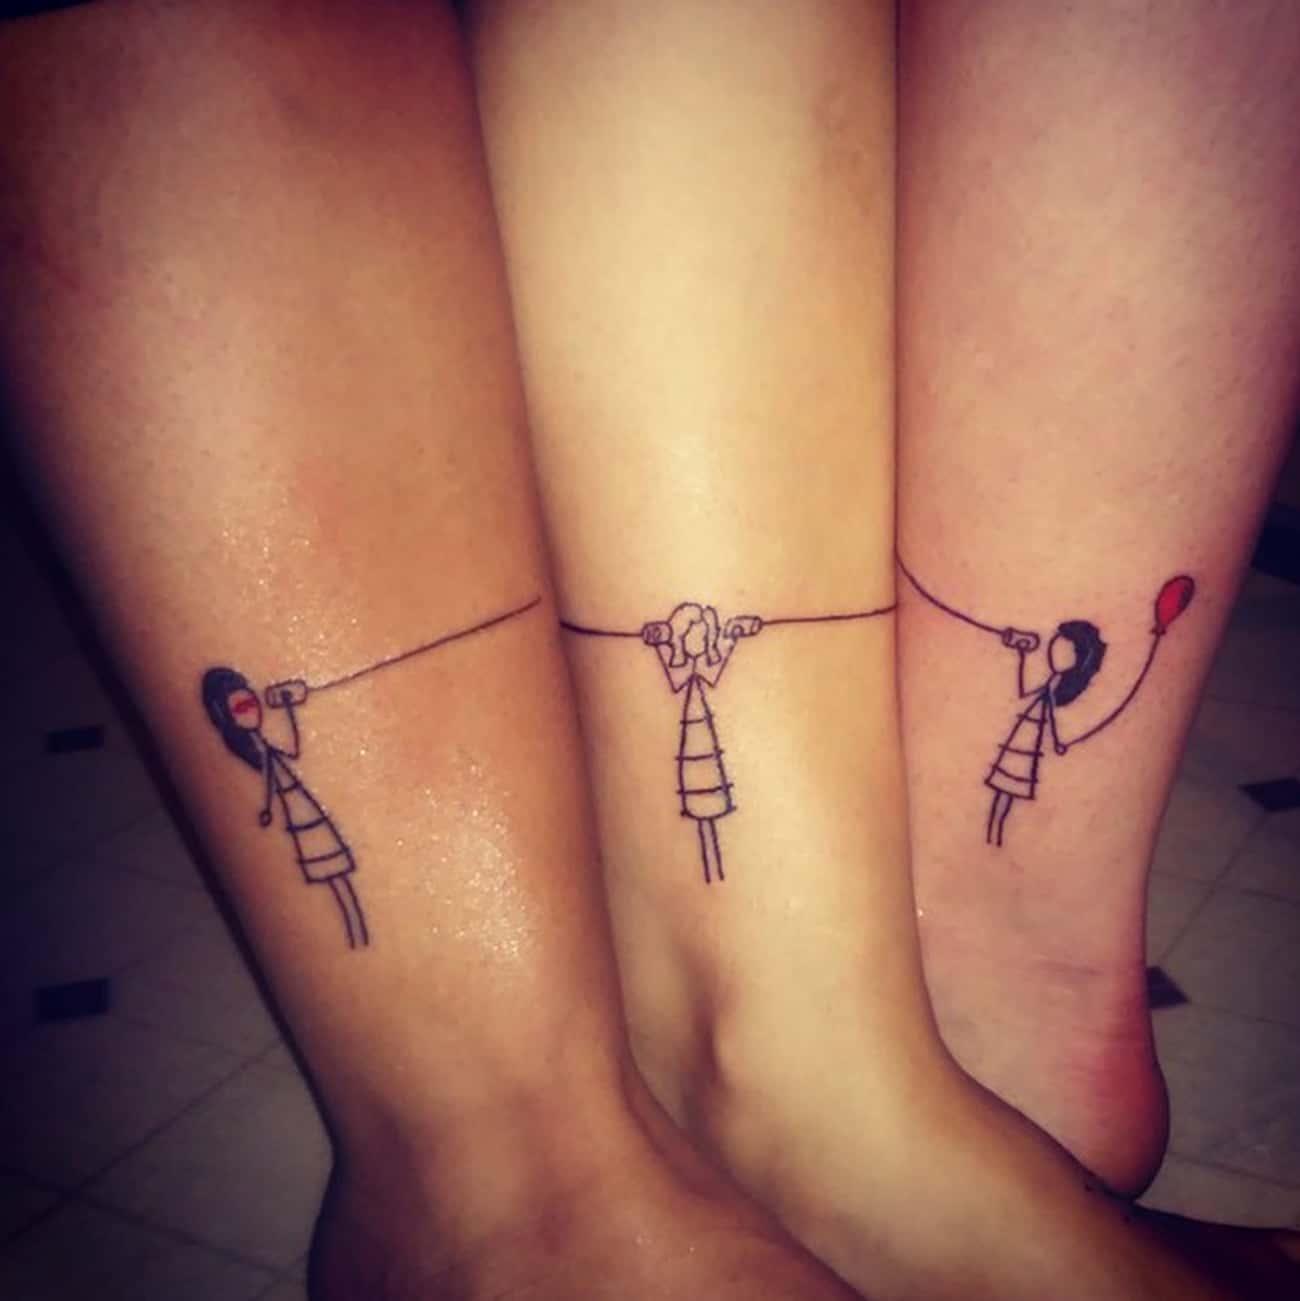 Stick Figure Best Friend Tatto is listed (or ranked) 2 on the list Best Friend Tattoo Ideas